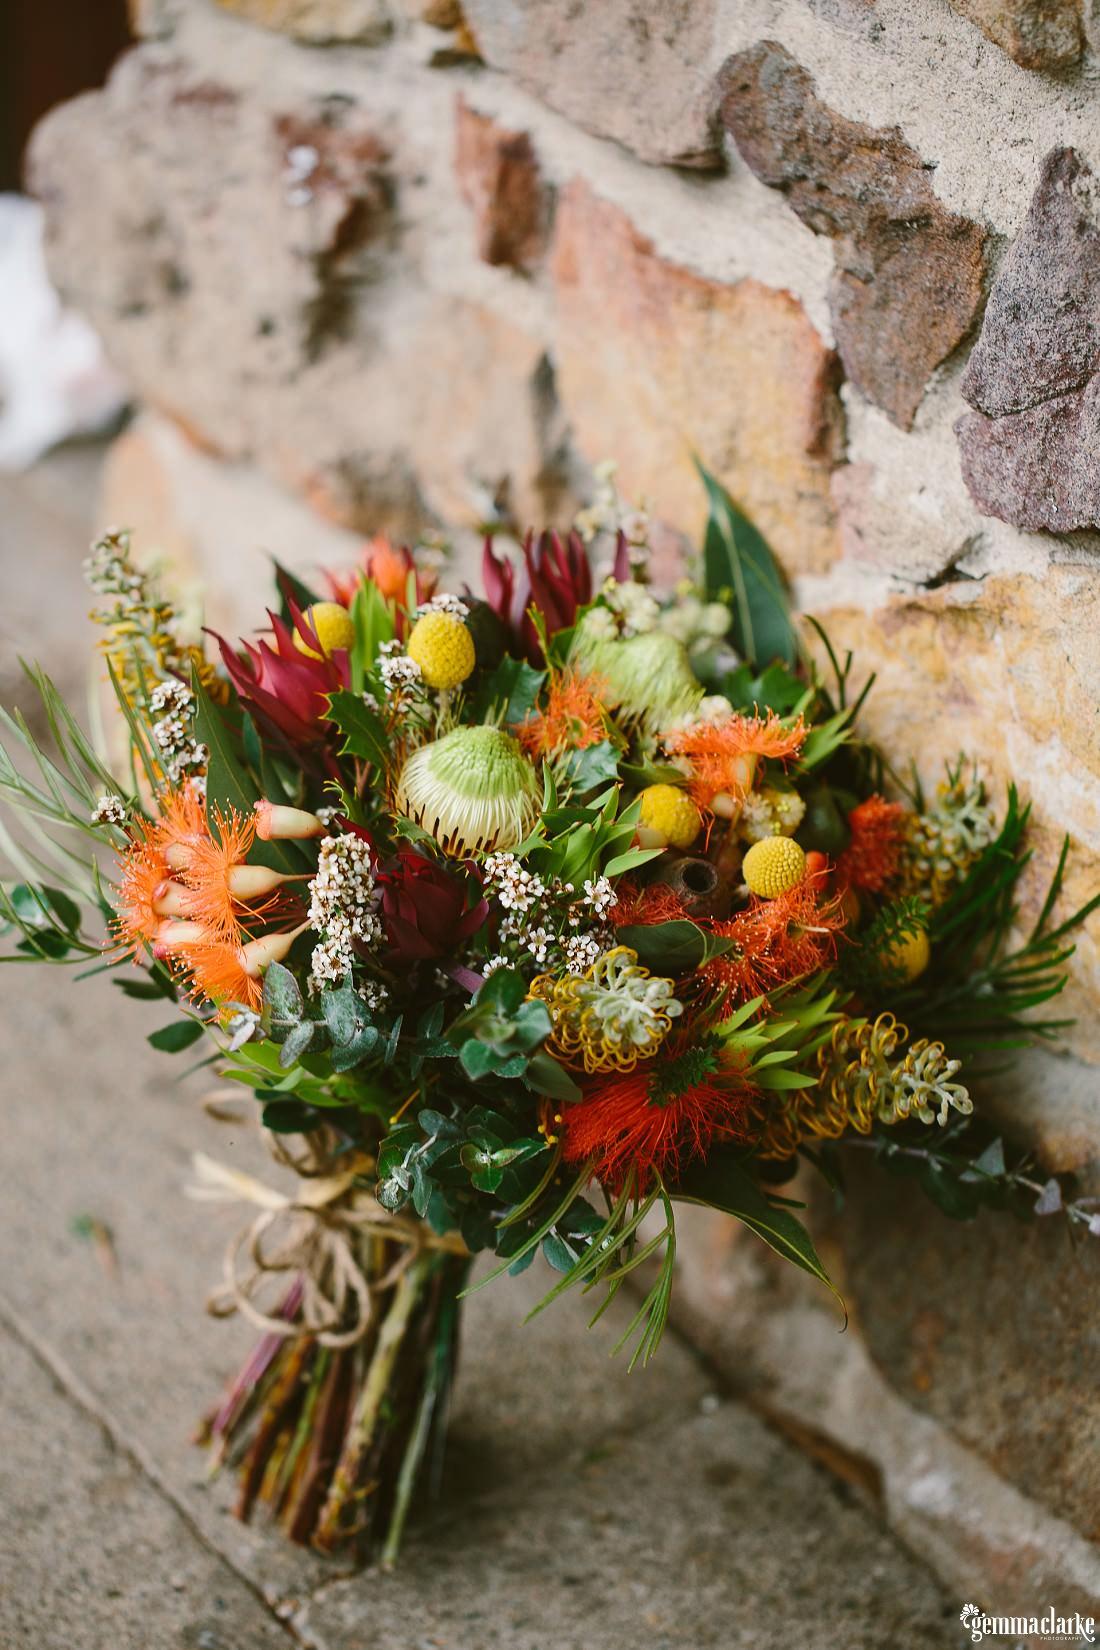 Australian native bridal bouquet - Kangaroo Valley Bush Retreat